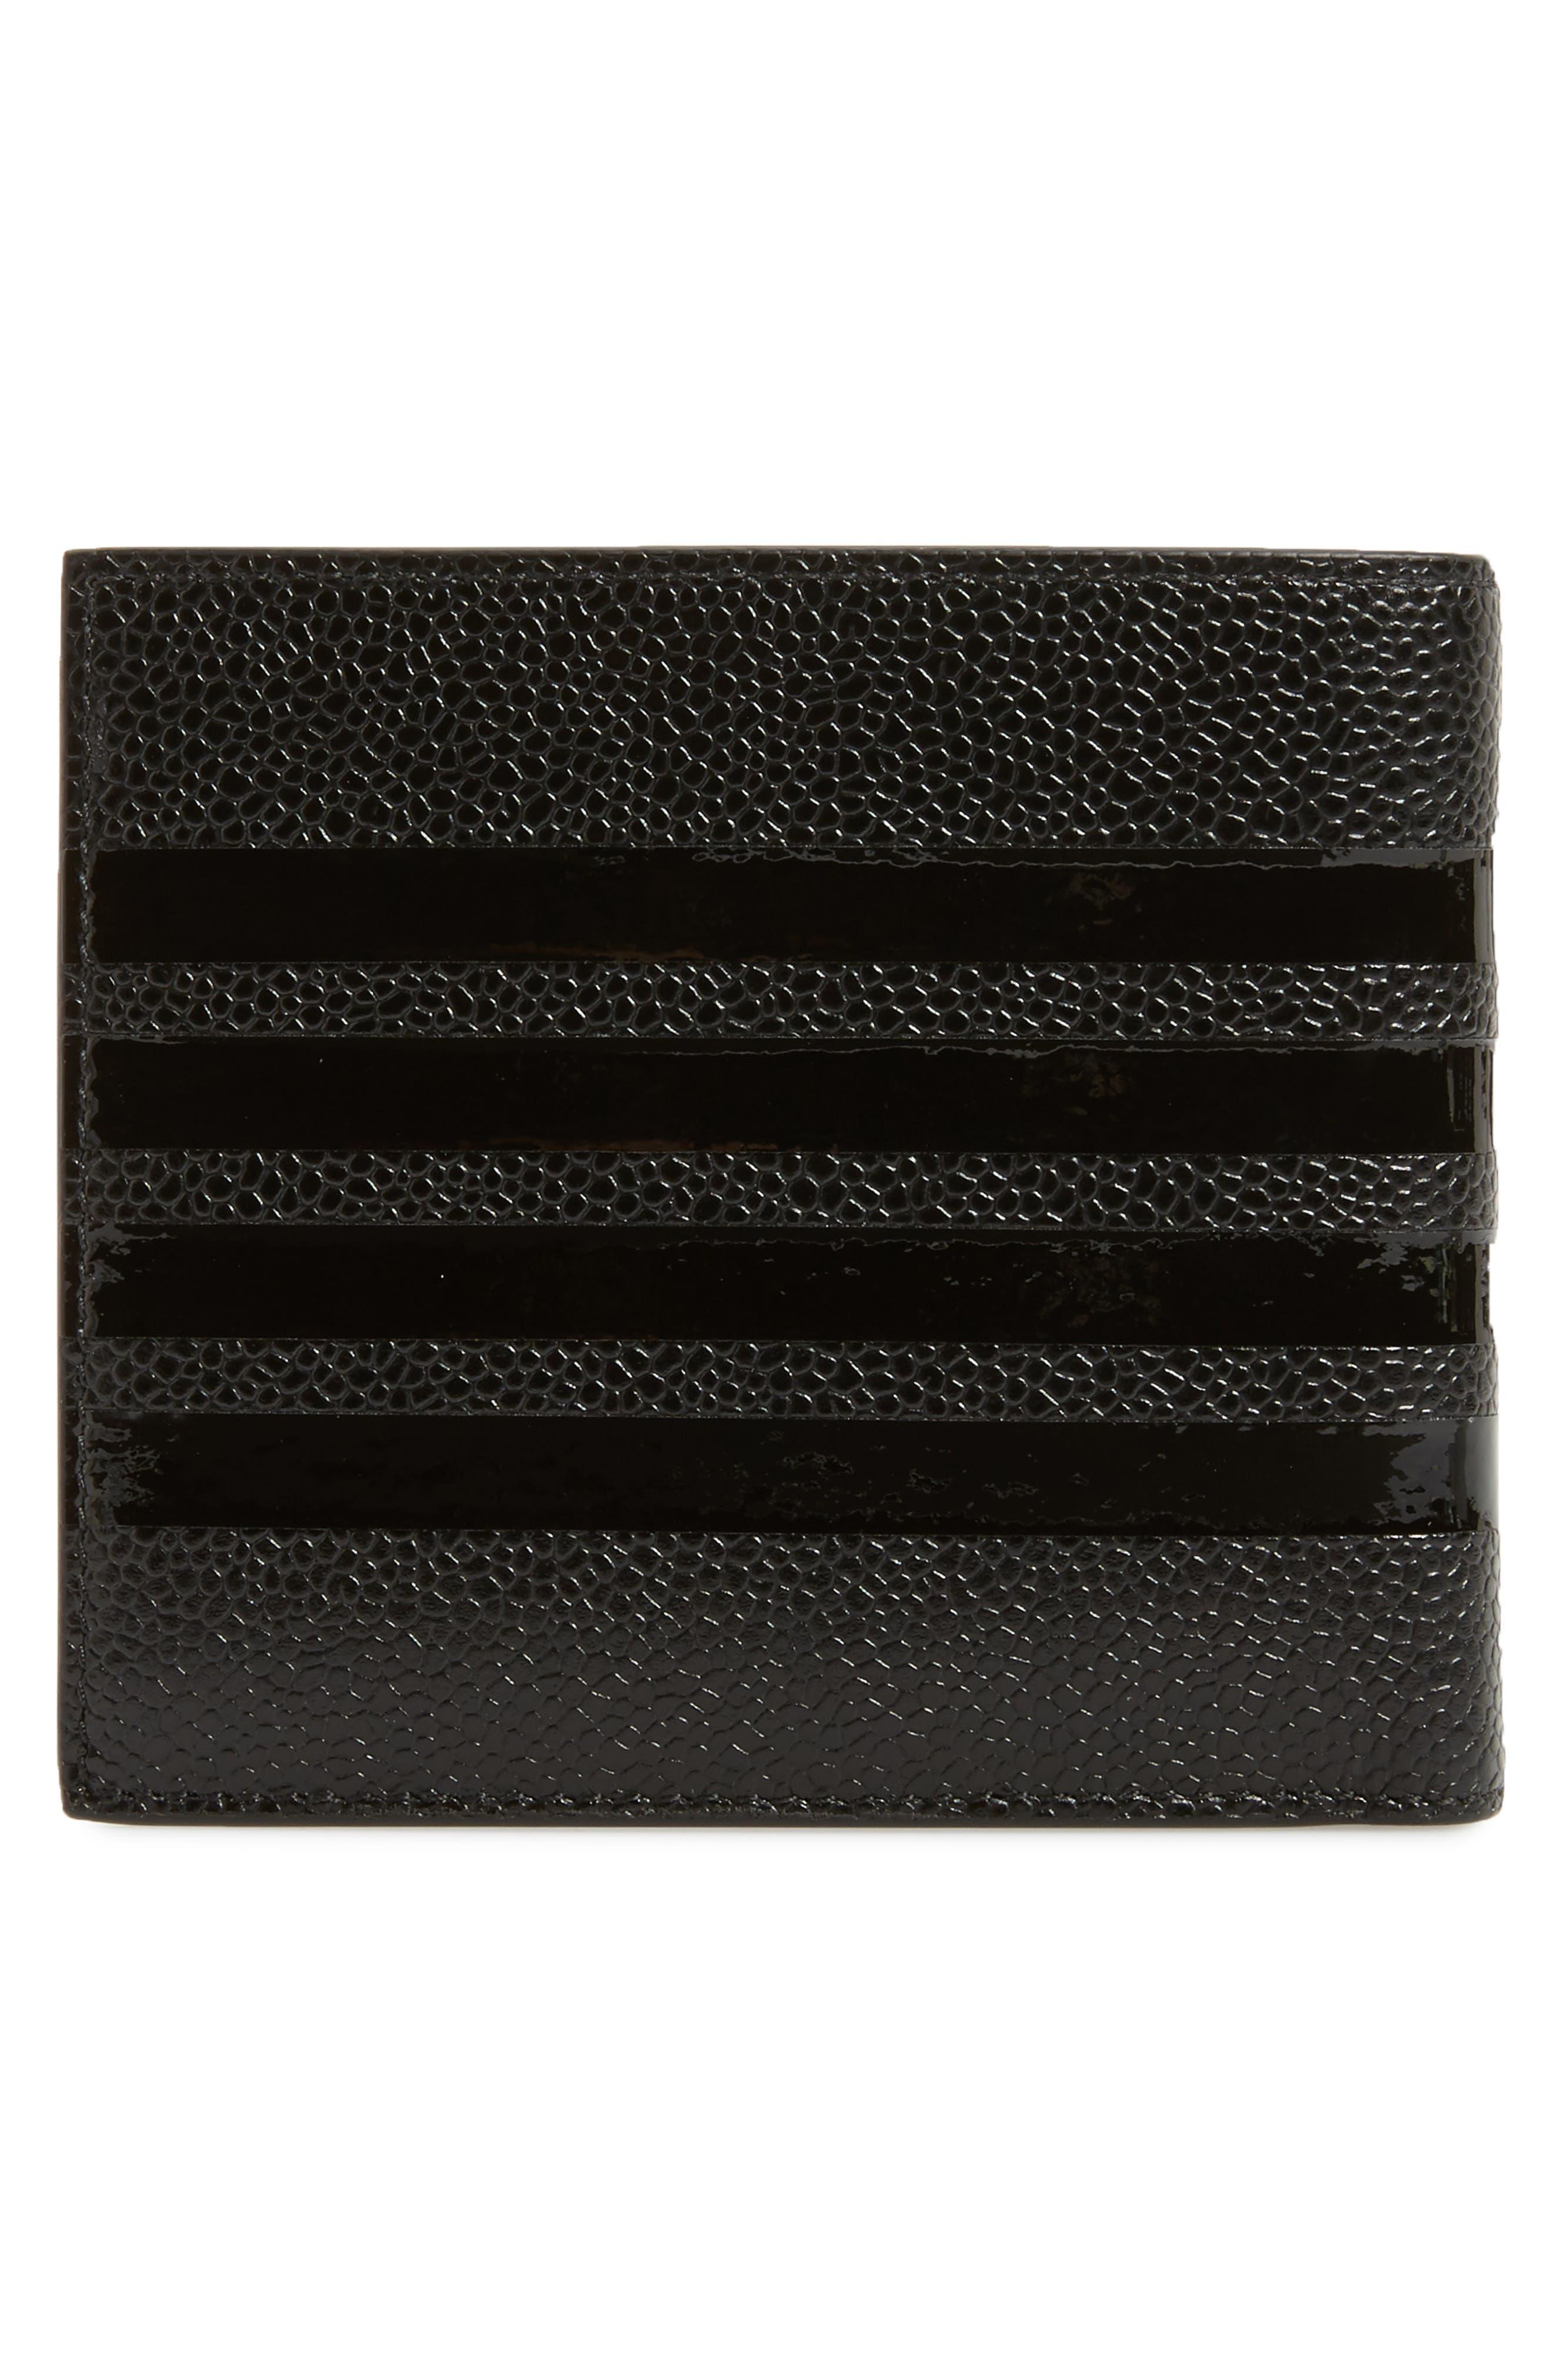 Patent Leather Bifold Wallet,                             Alternate thumbnail 3, color,                             Black